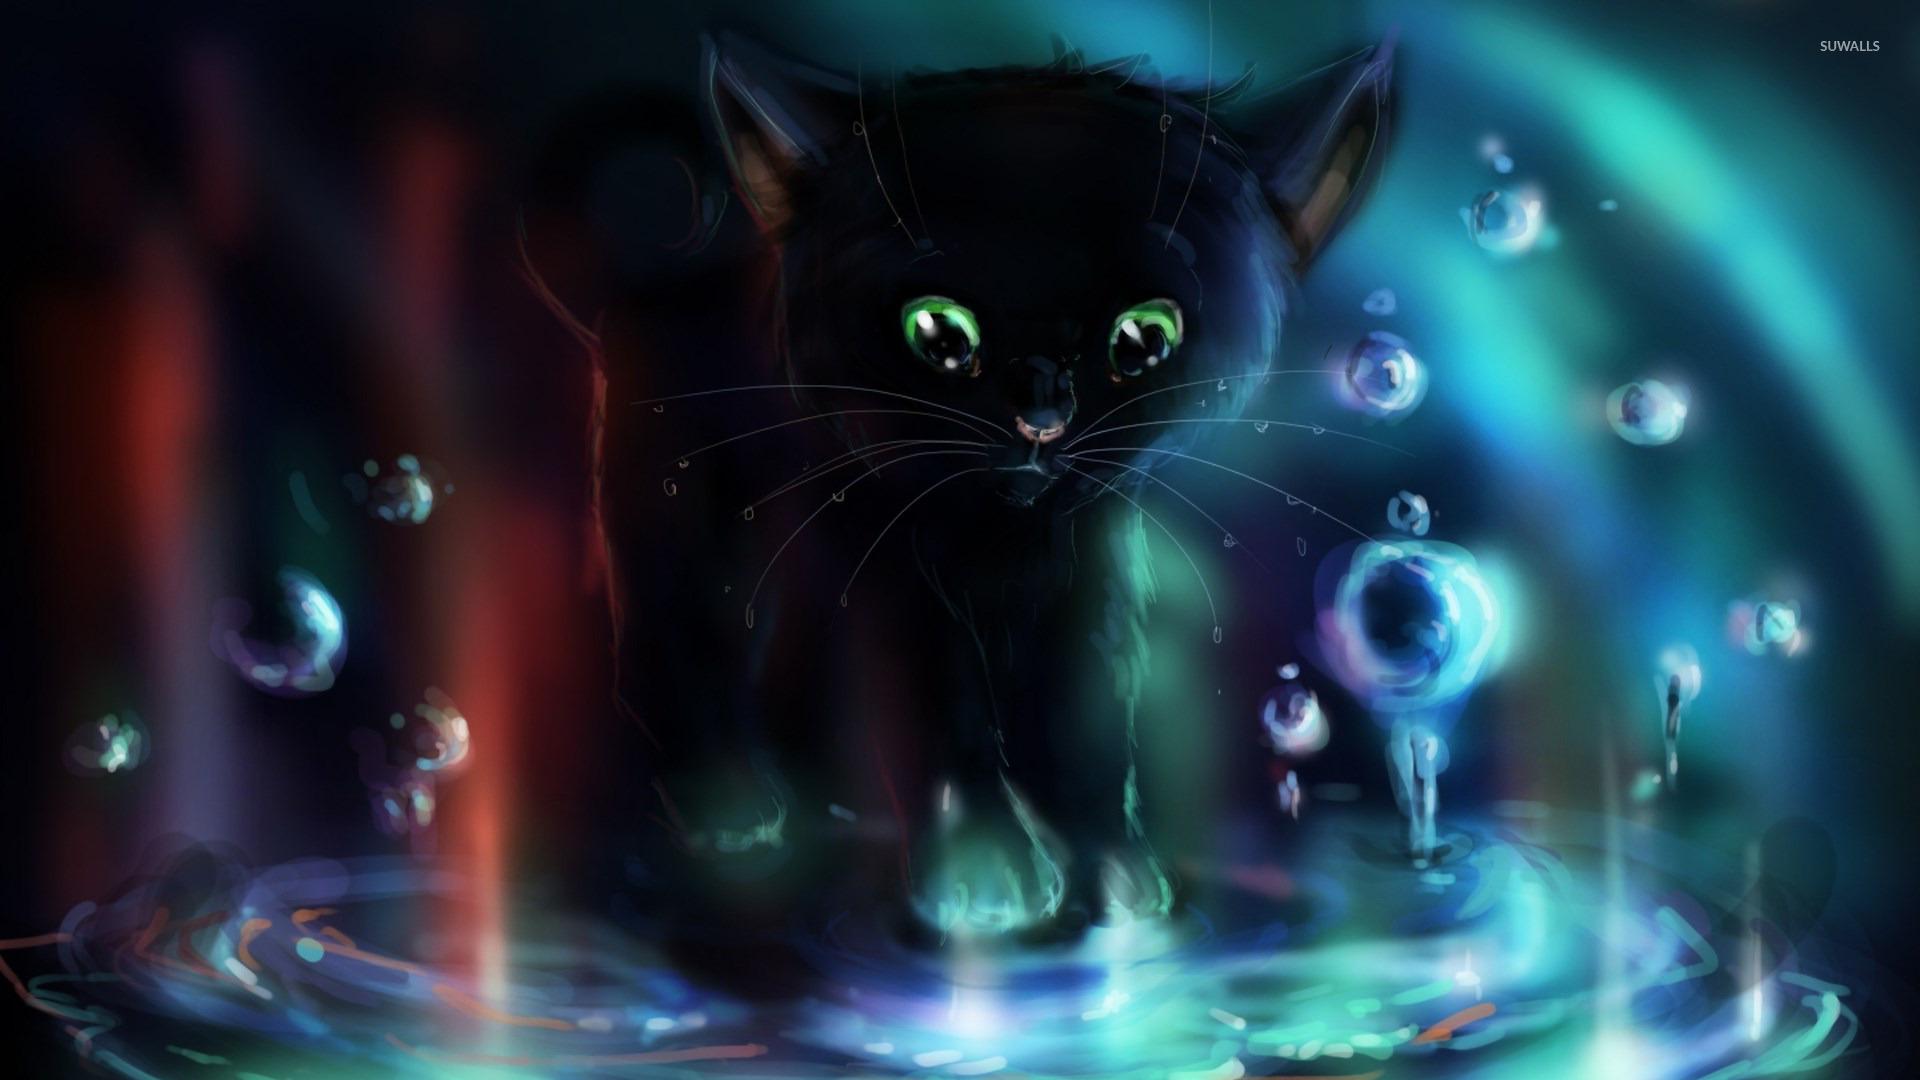 Cute Black Cat Halloween Desktop Backgrounds hd